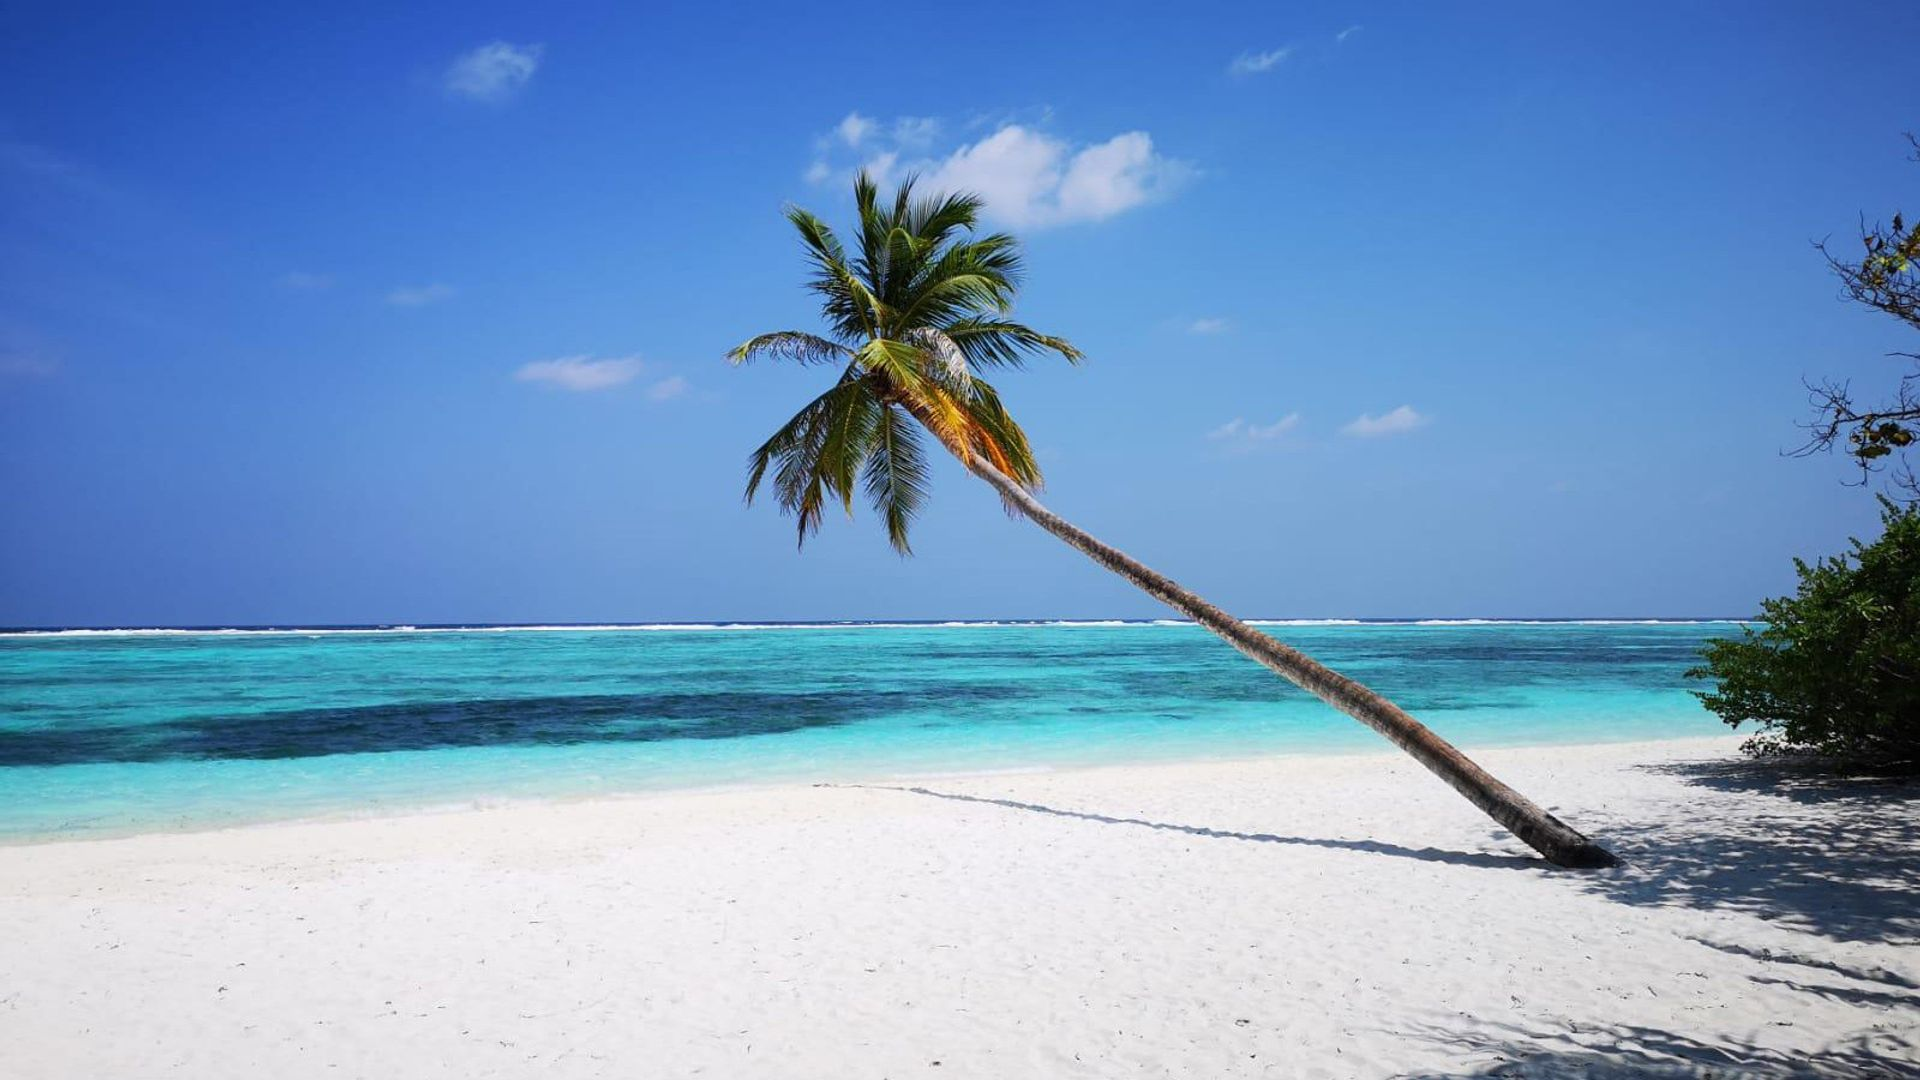 Sejur Dubai & plaja Maldive, 11 zile